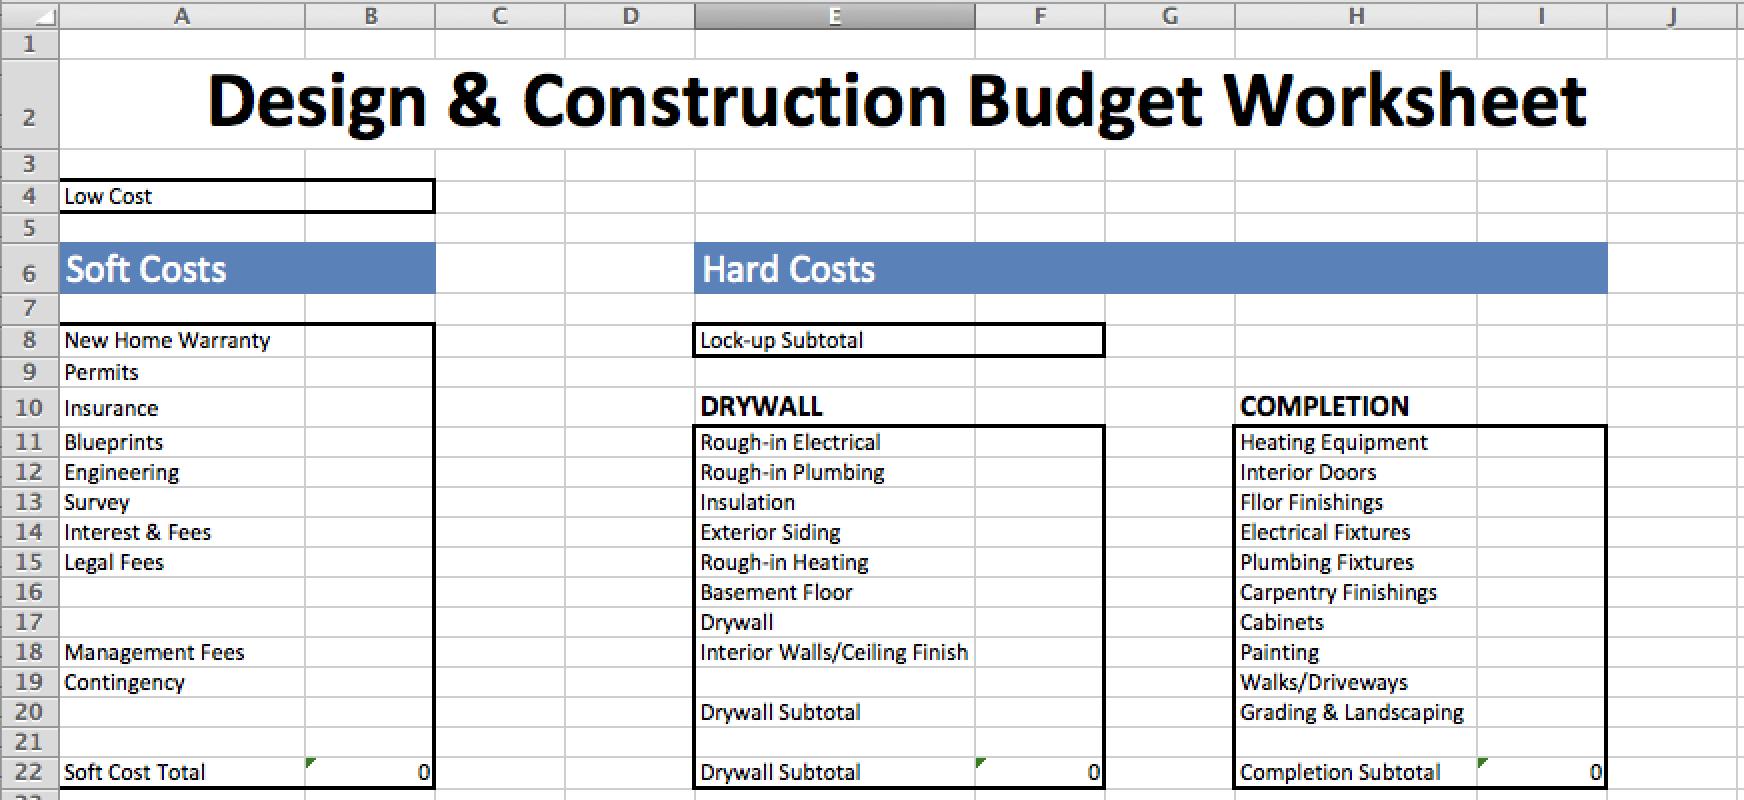 4 Best Design Construction Cost Estimation Methods